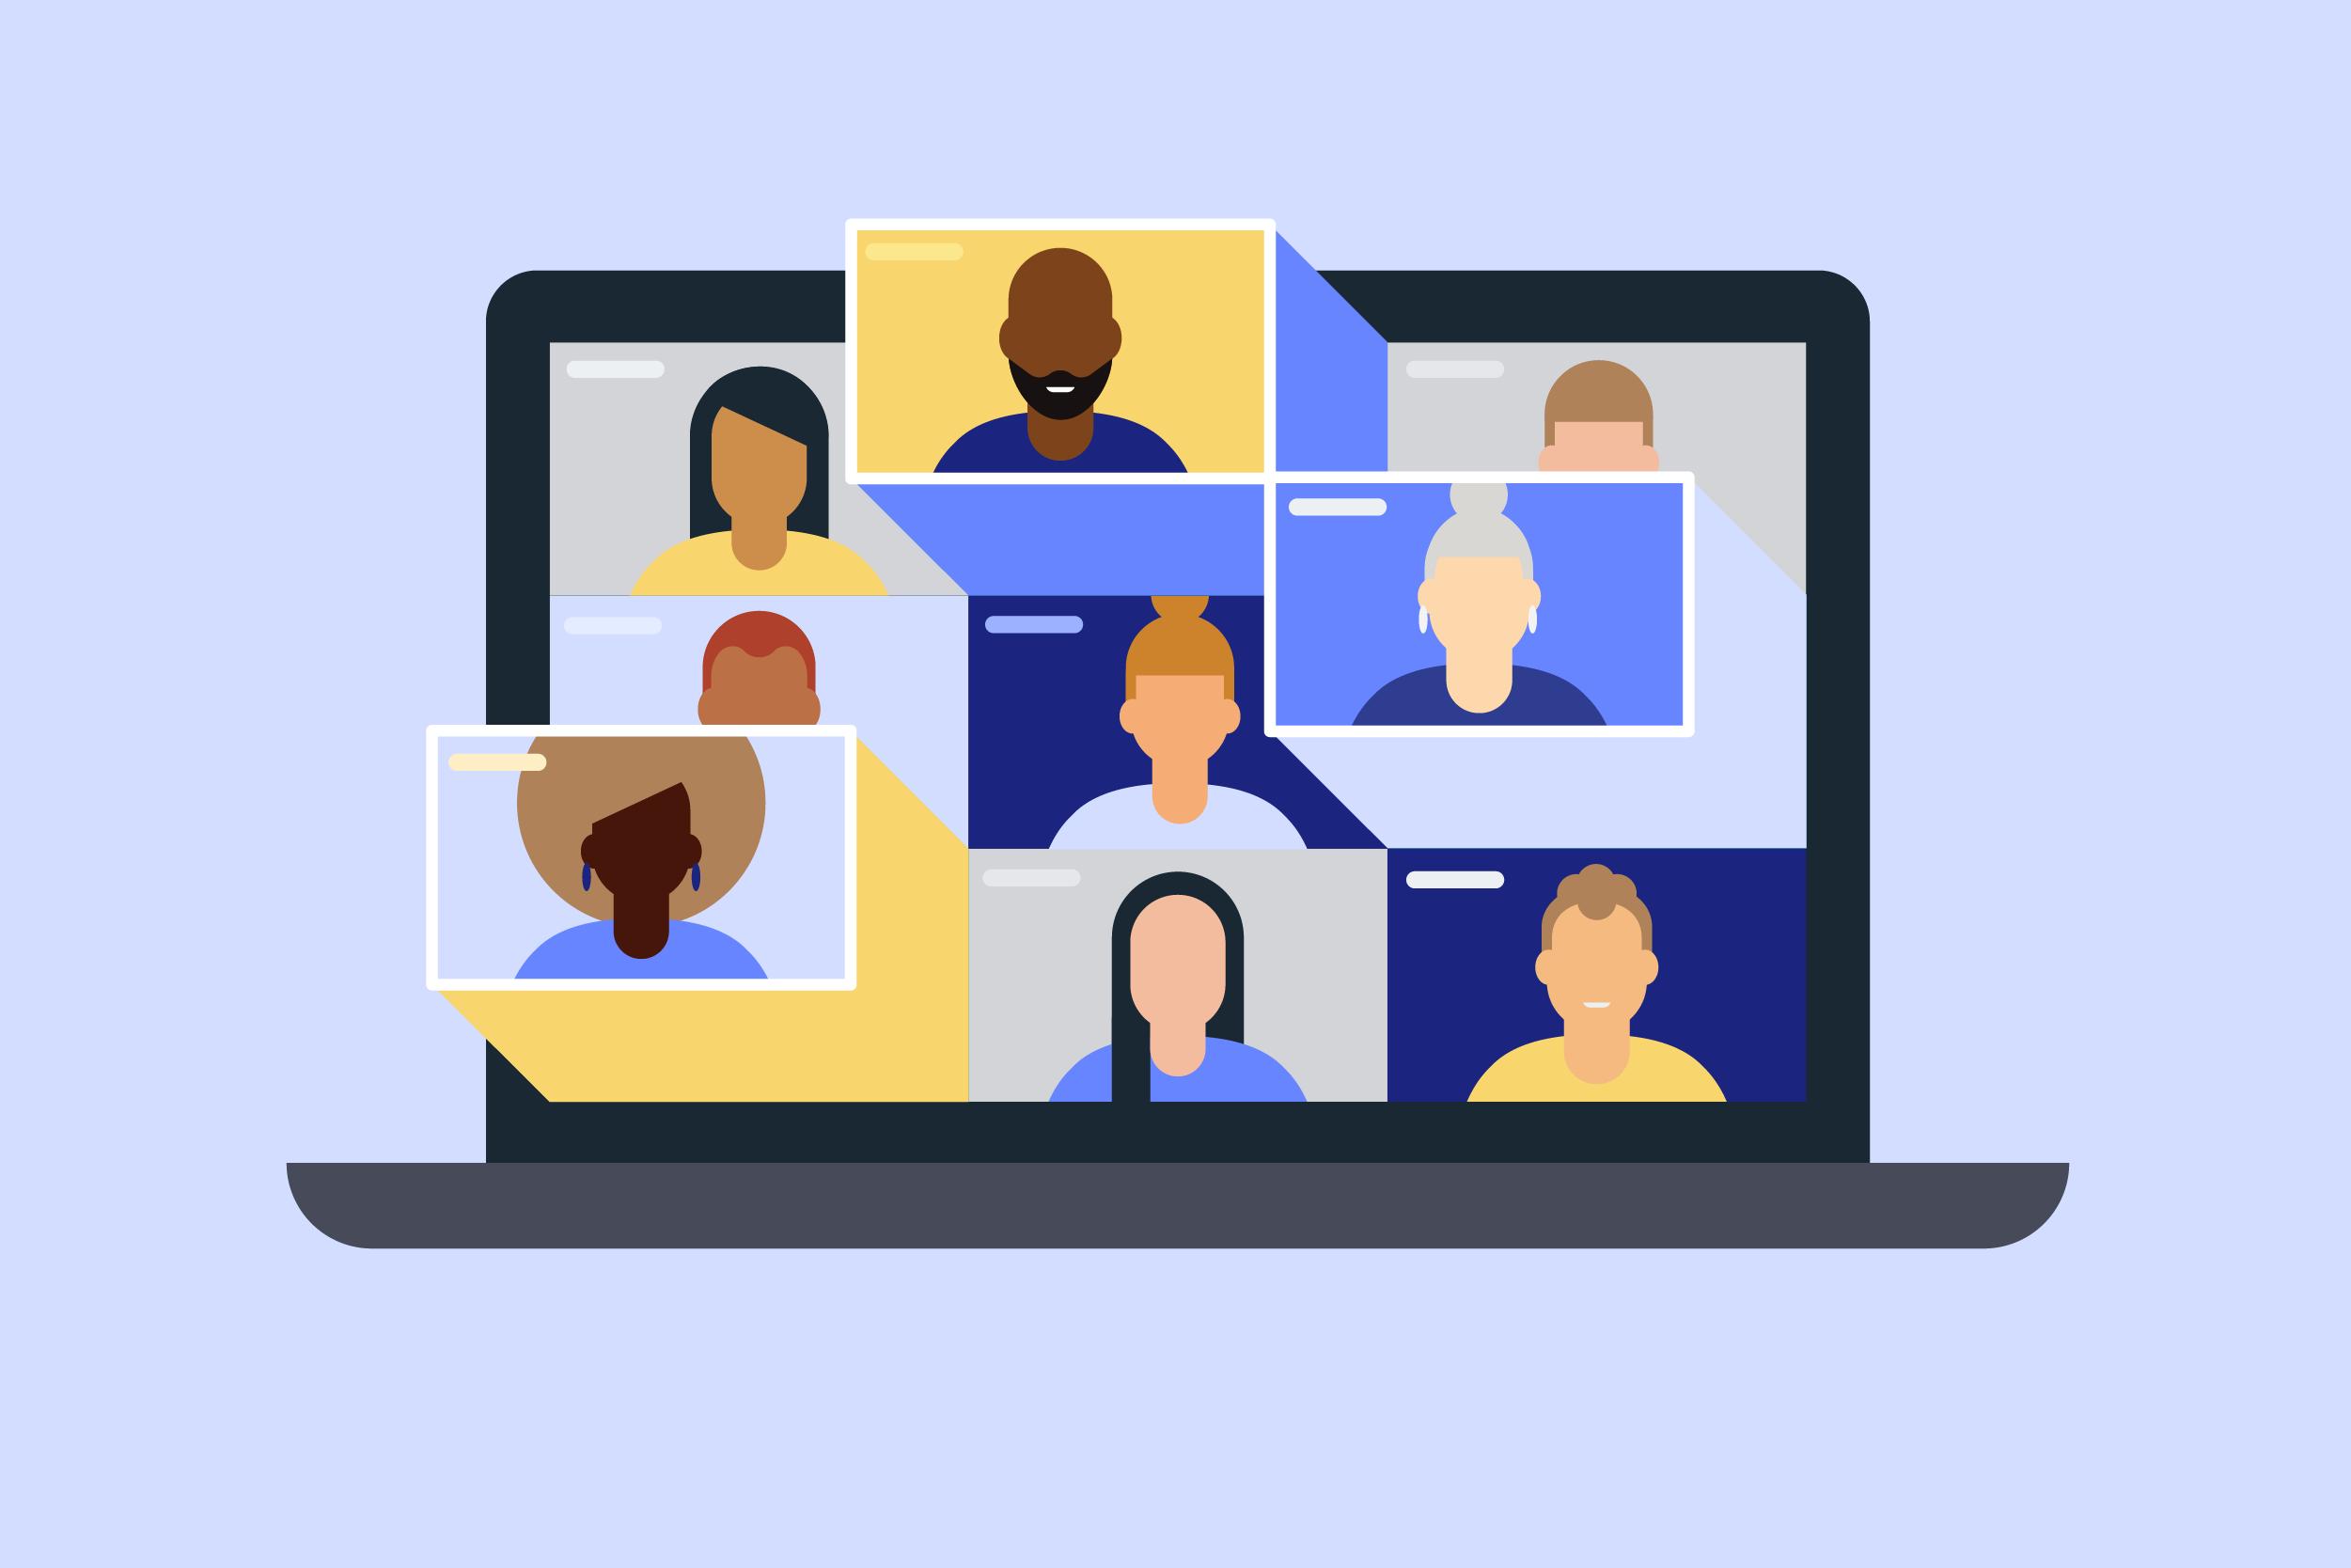 How You Interact In Online Communities Matters (No Matter The Platform)